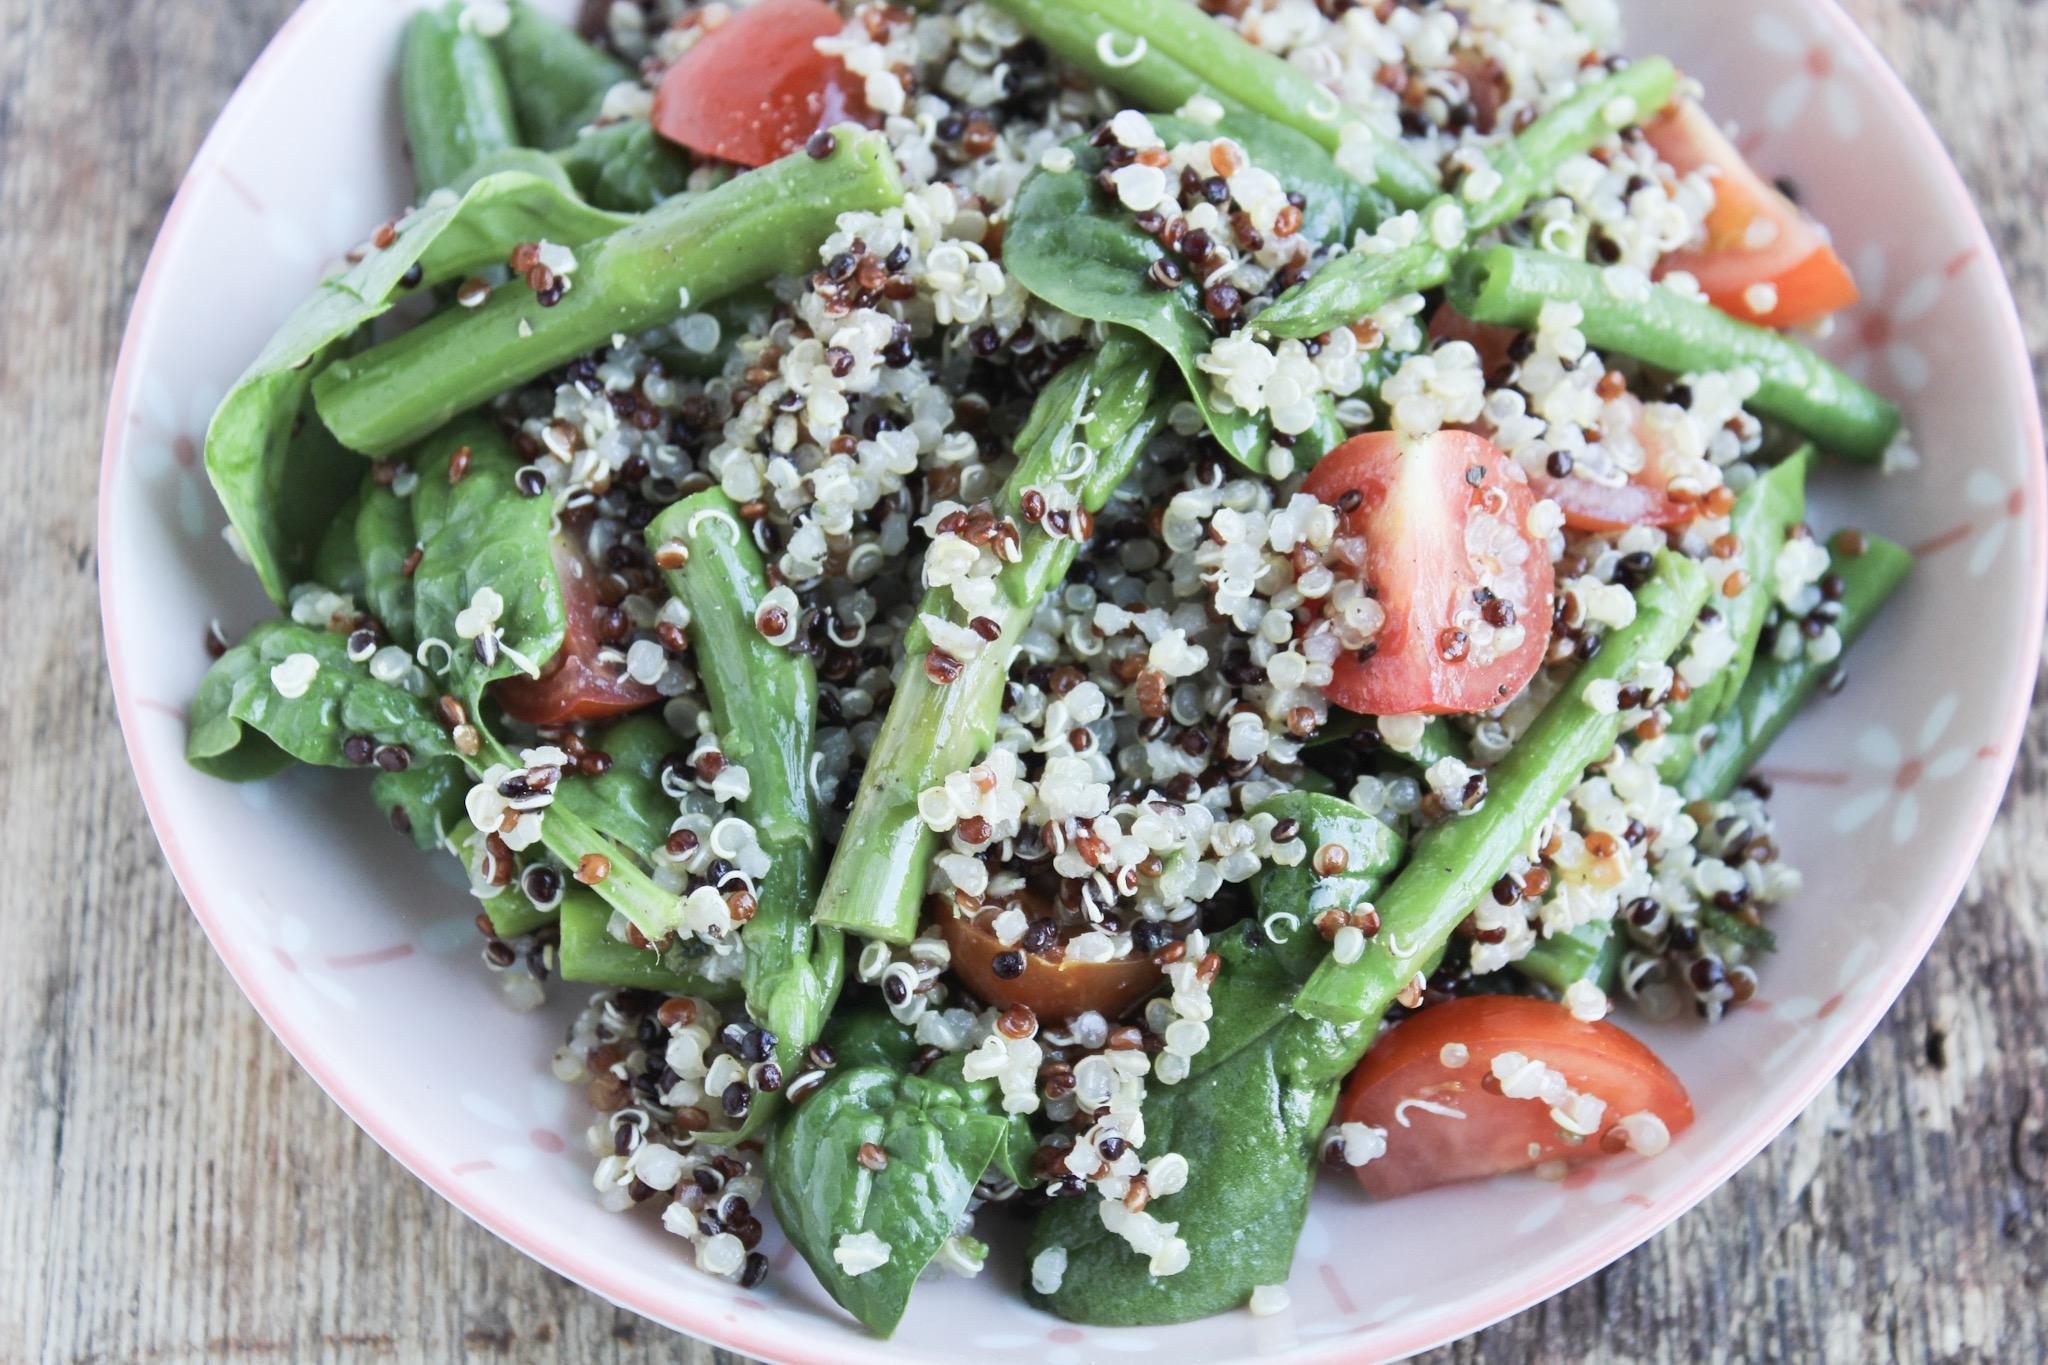 Quinoa Salad With Asparagus & Green Beans